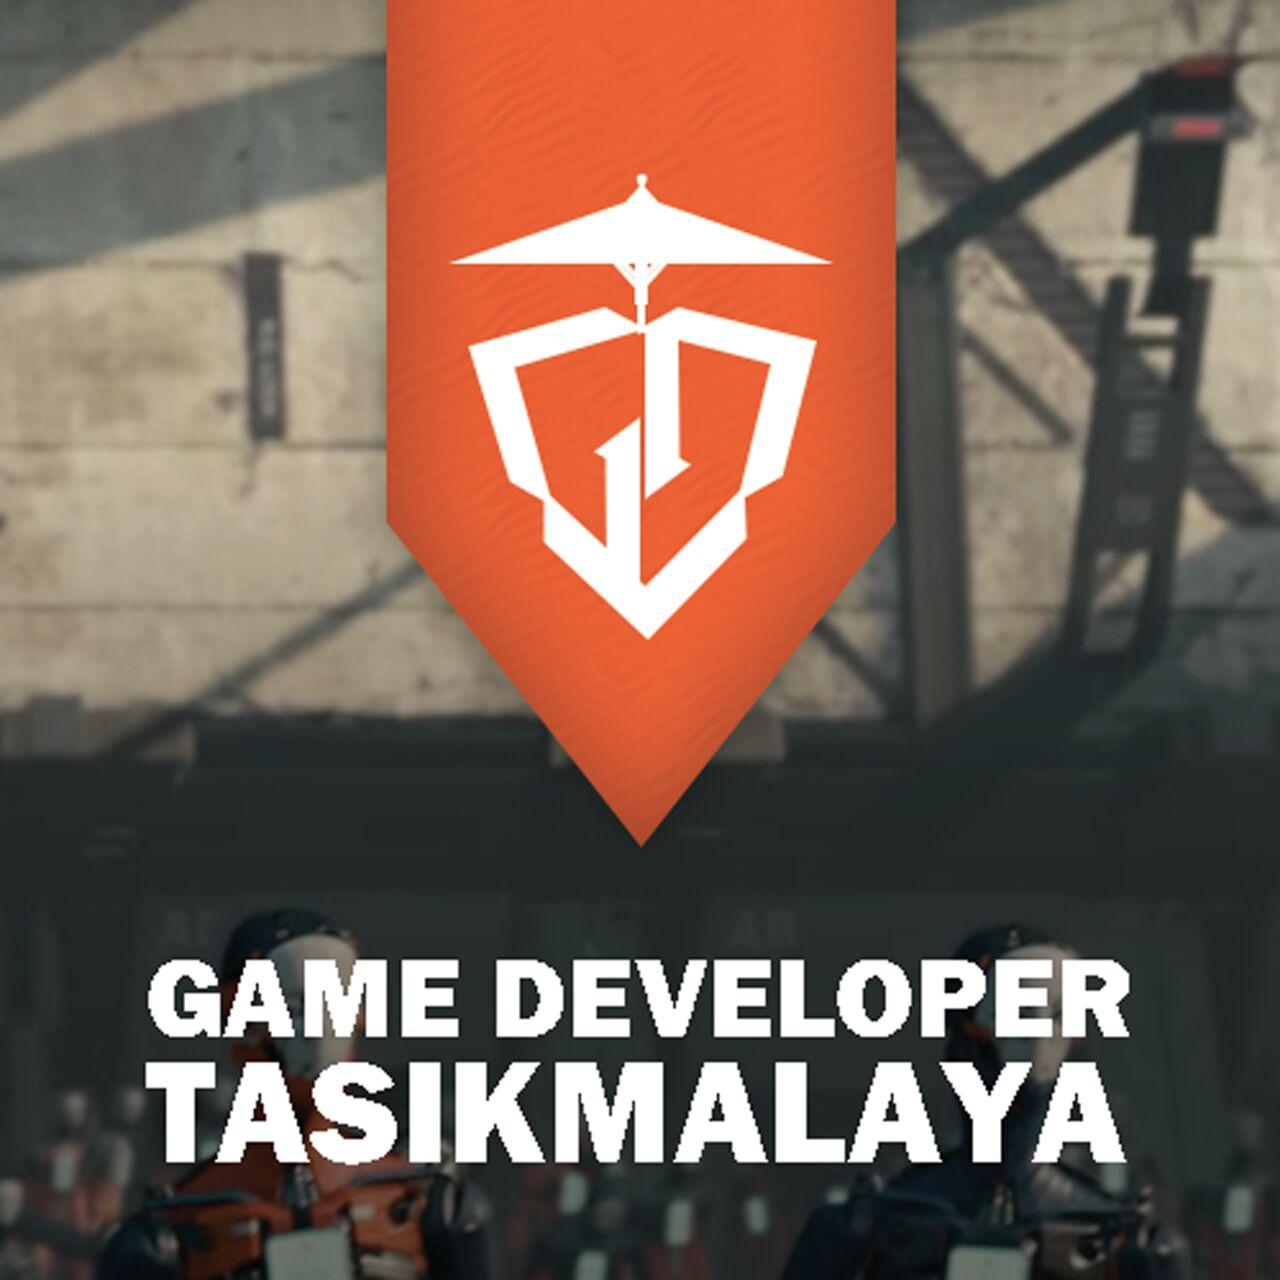 Family Gathering Game Developer Tasikmalaya #1